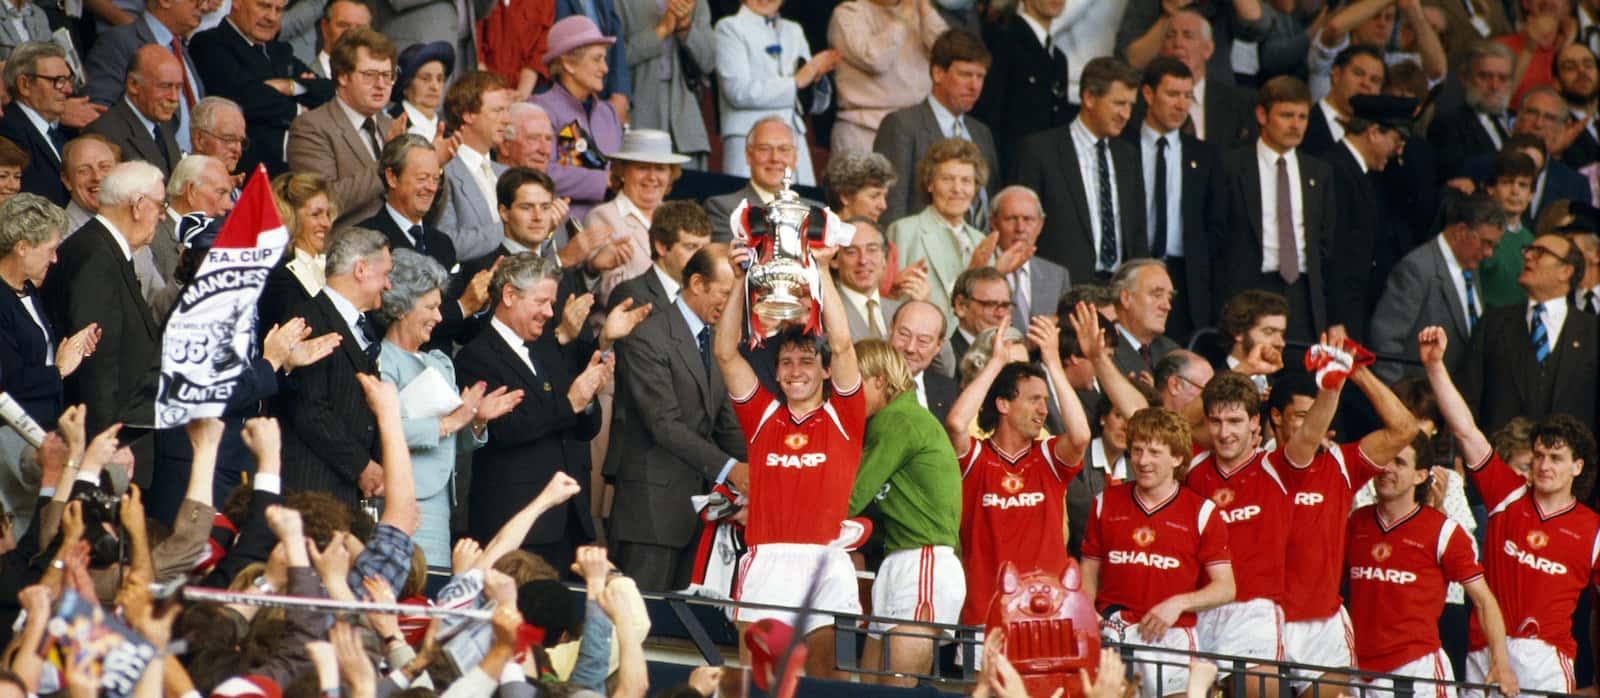 FA Cup Final Series 1984/5: Everton 0-1 Man United